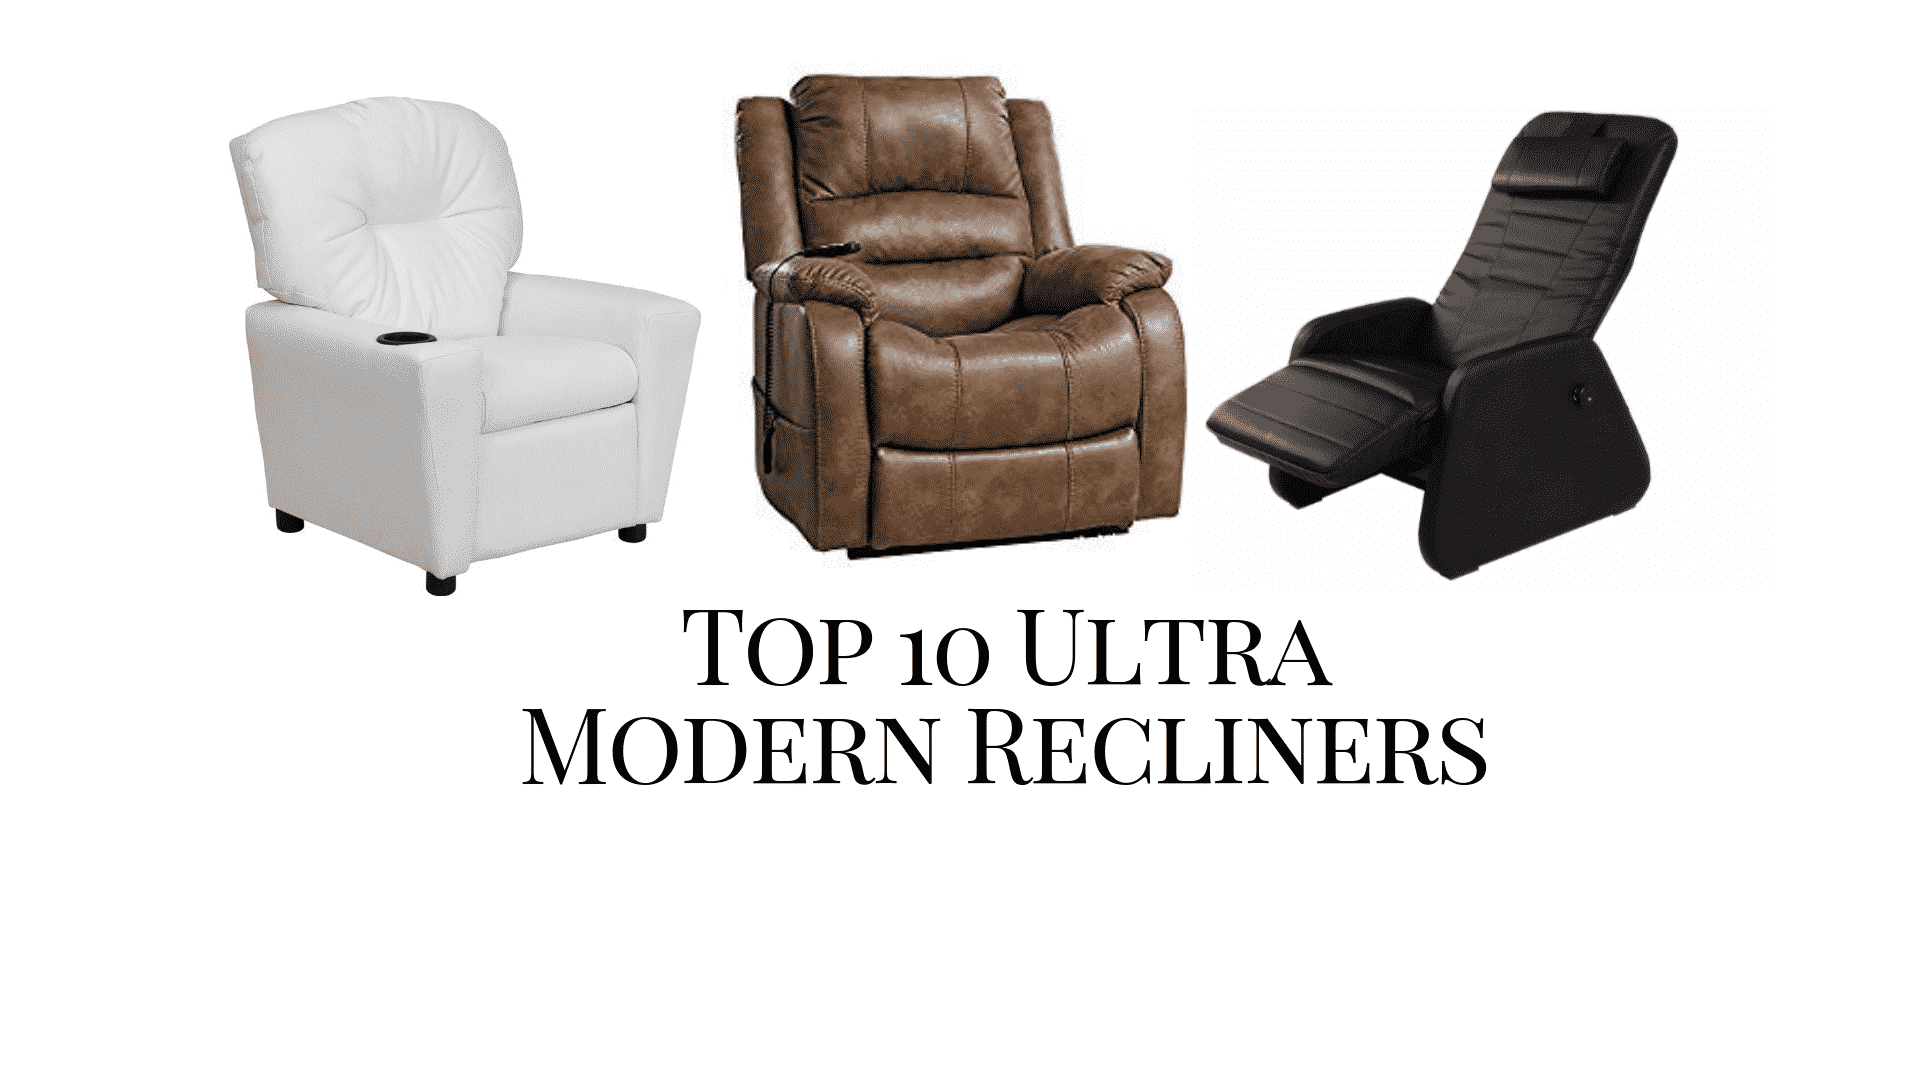 Top 10 Ultra Modern Recliners 2019 Reviews Guide